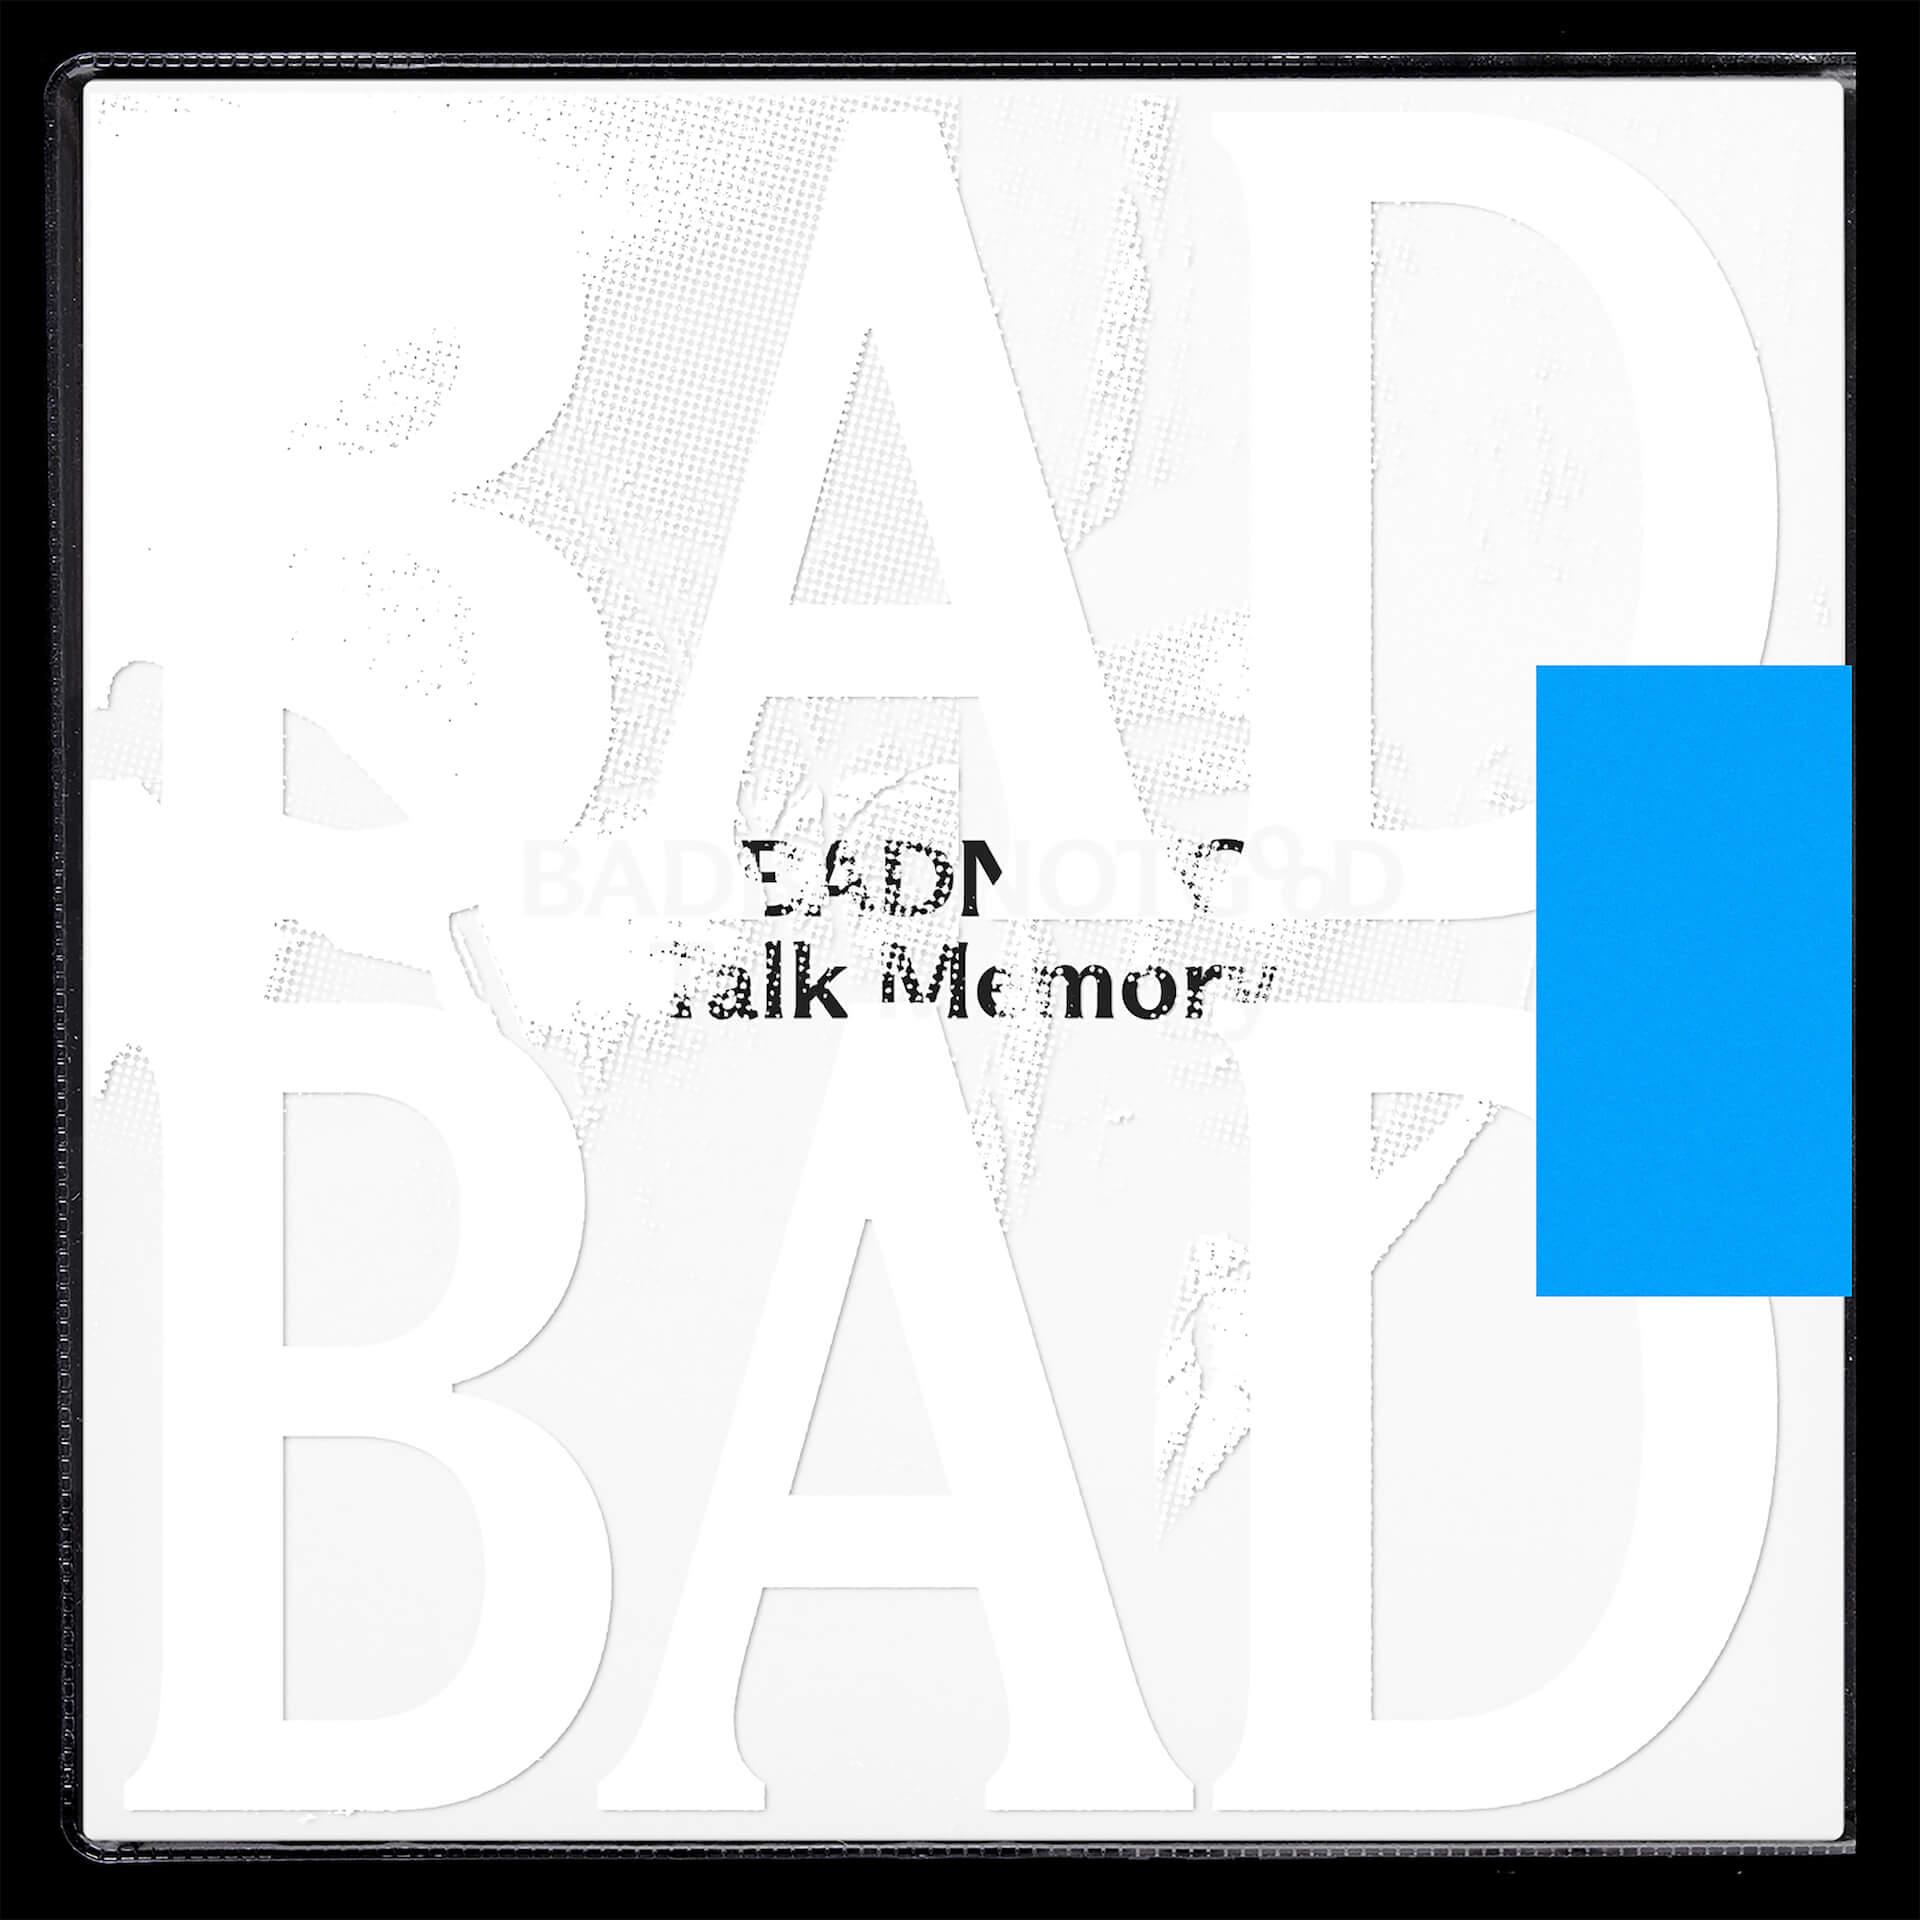 "BADBADNOTGOODのカバー動画コラボ企画にOvallが参加!""Signal From The Noise""をリアレンジ music210922_ovall_bbng_1"